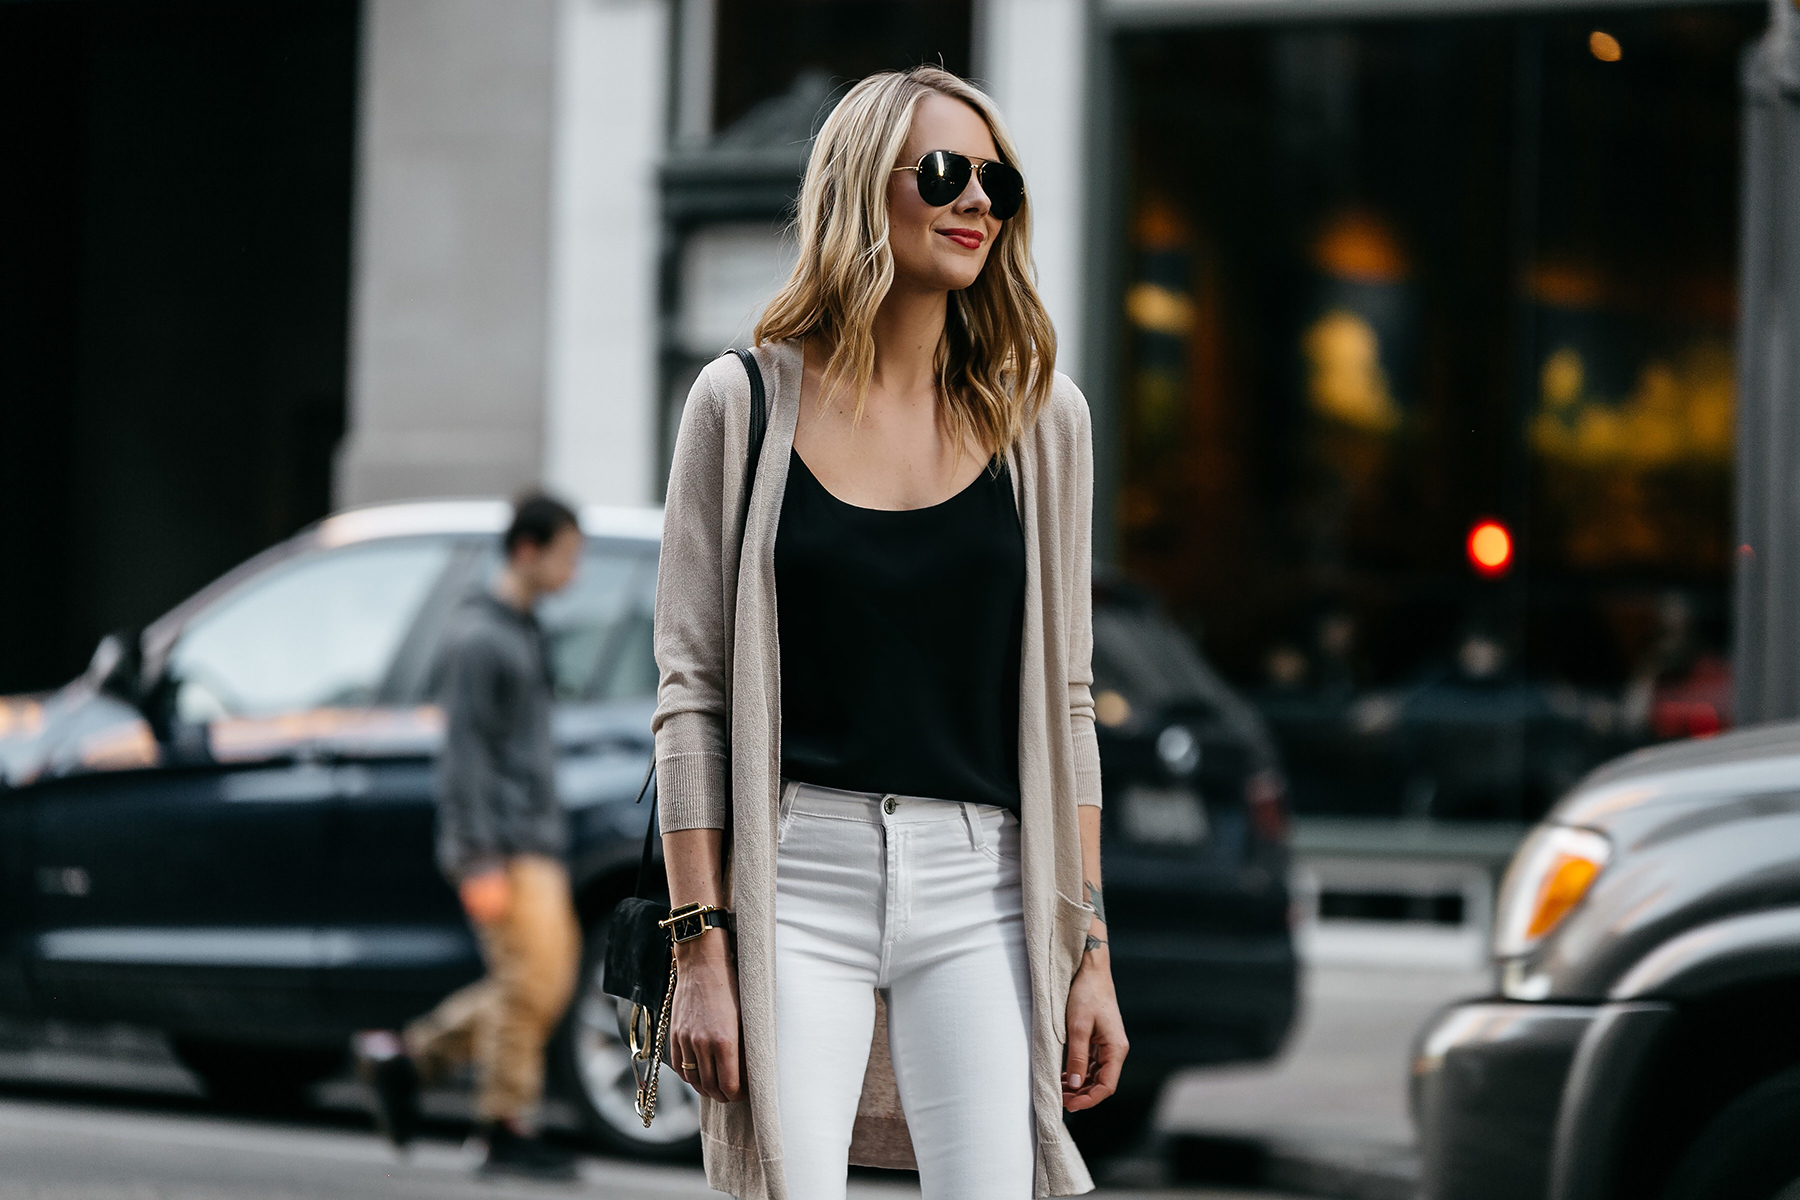 Fashion Jackson, Dallas Blogger, Fashion Blogger, Street Style, Long Beige Cardigan, Black Cami Tank, White Ripped Skinny Jeans, Chloe Faye Handbag